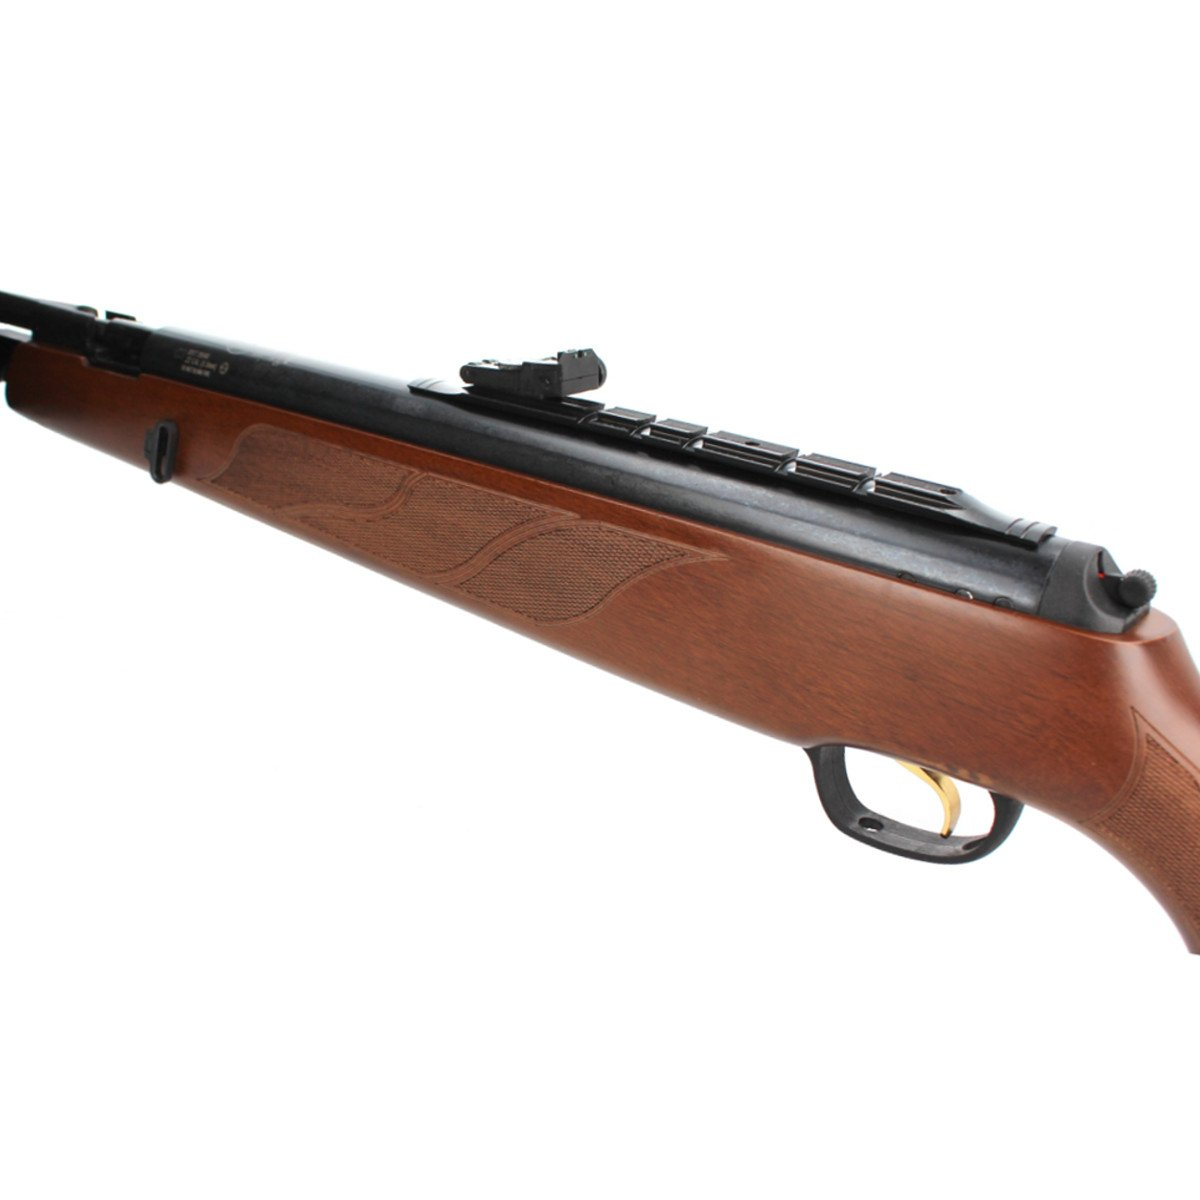 4591c34034 Hatsan 125TH Vortex Air Rifle Combo Hatsan Vortex  Wiatrówka Hatsan  (TORPEDO 155 VORTEX) Gazowa